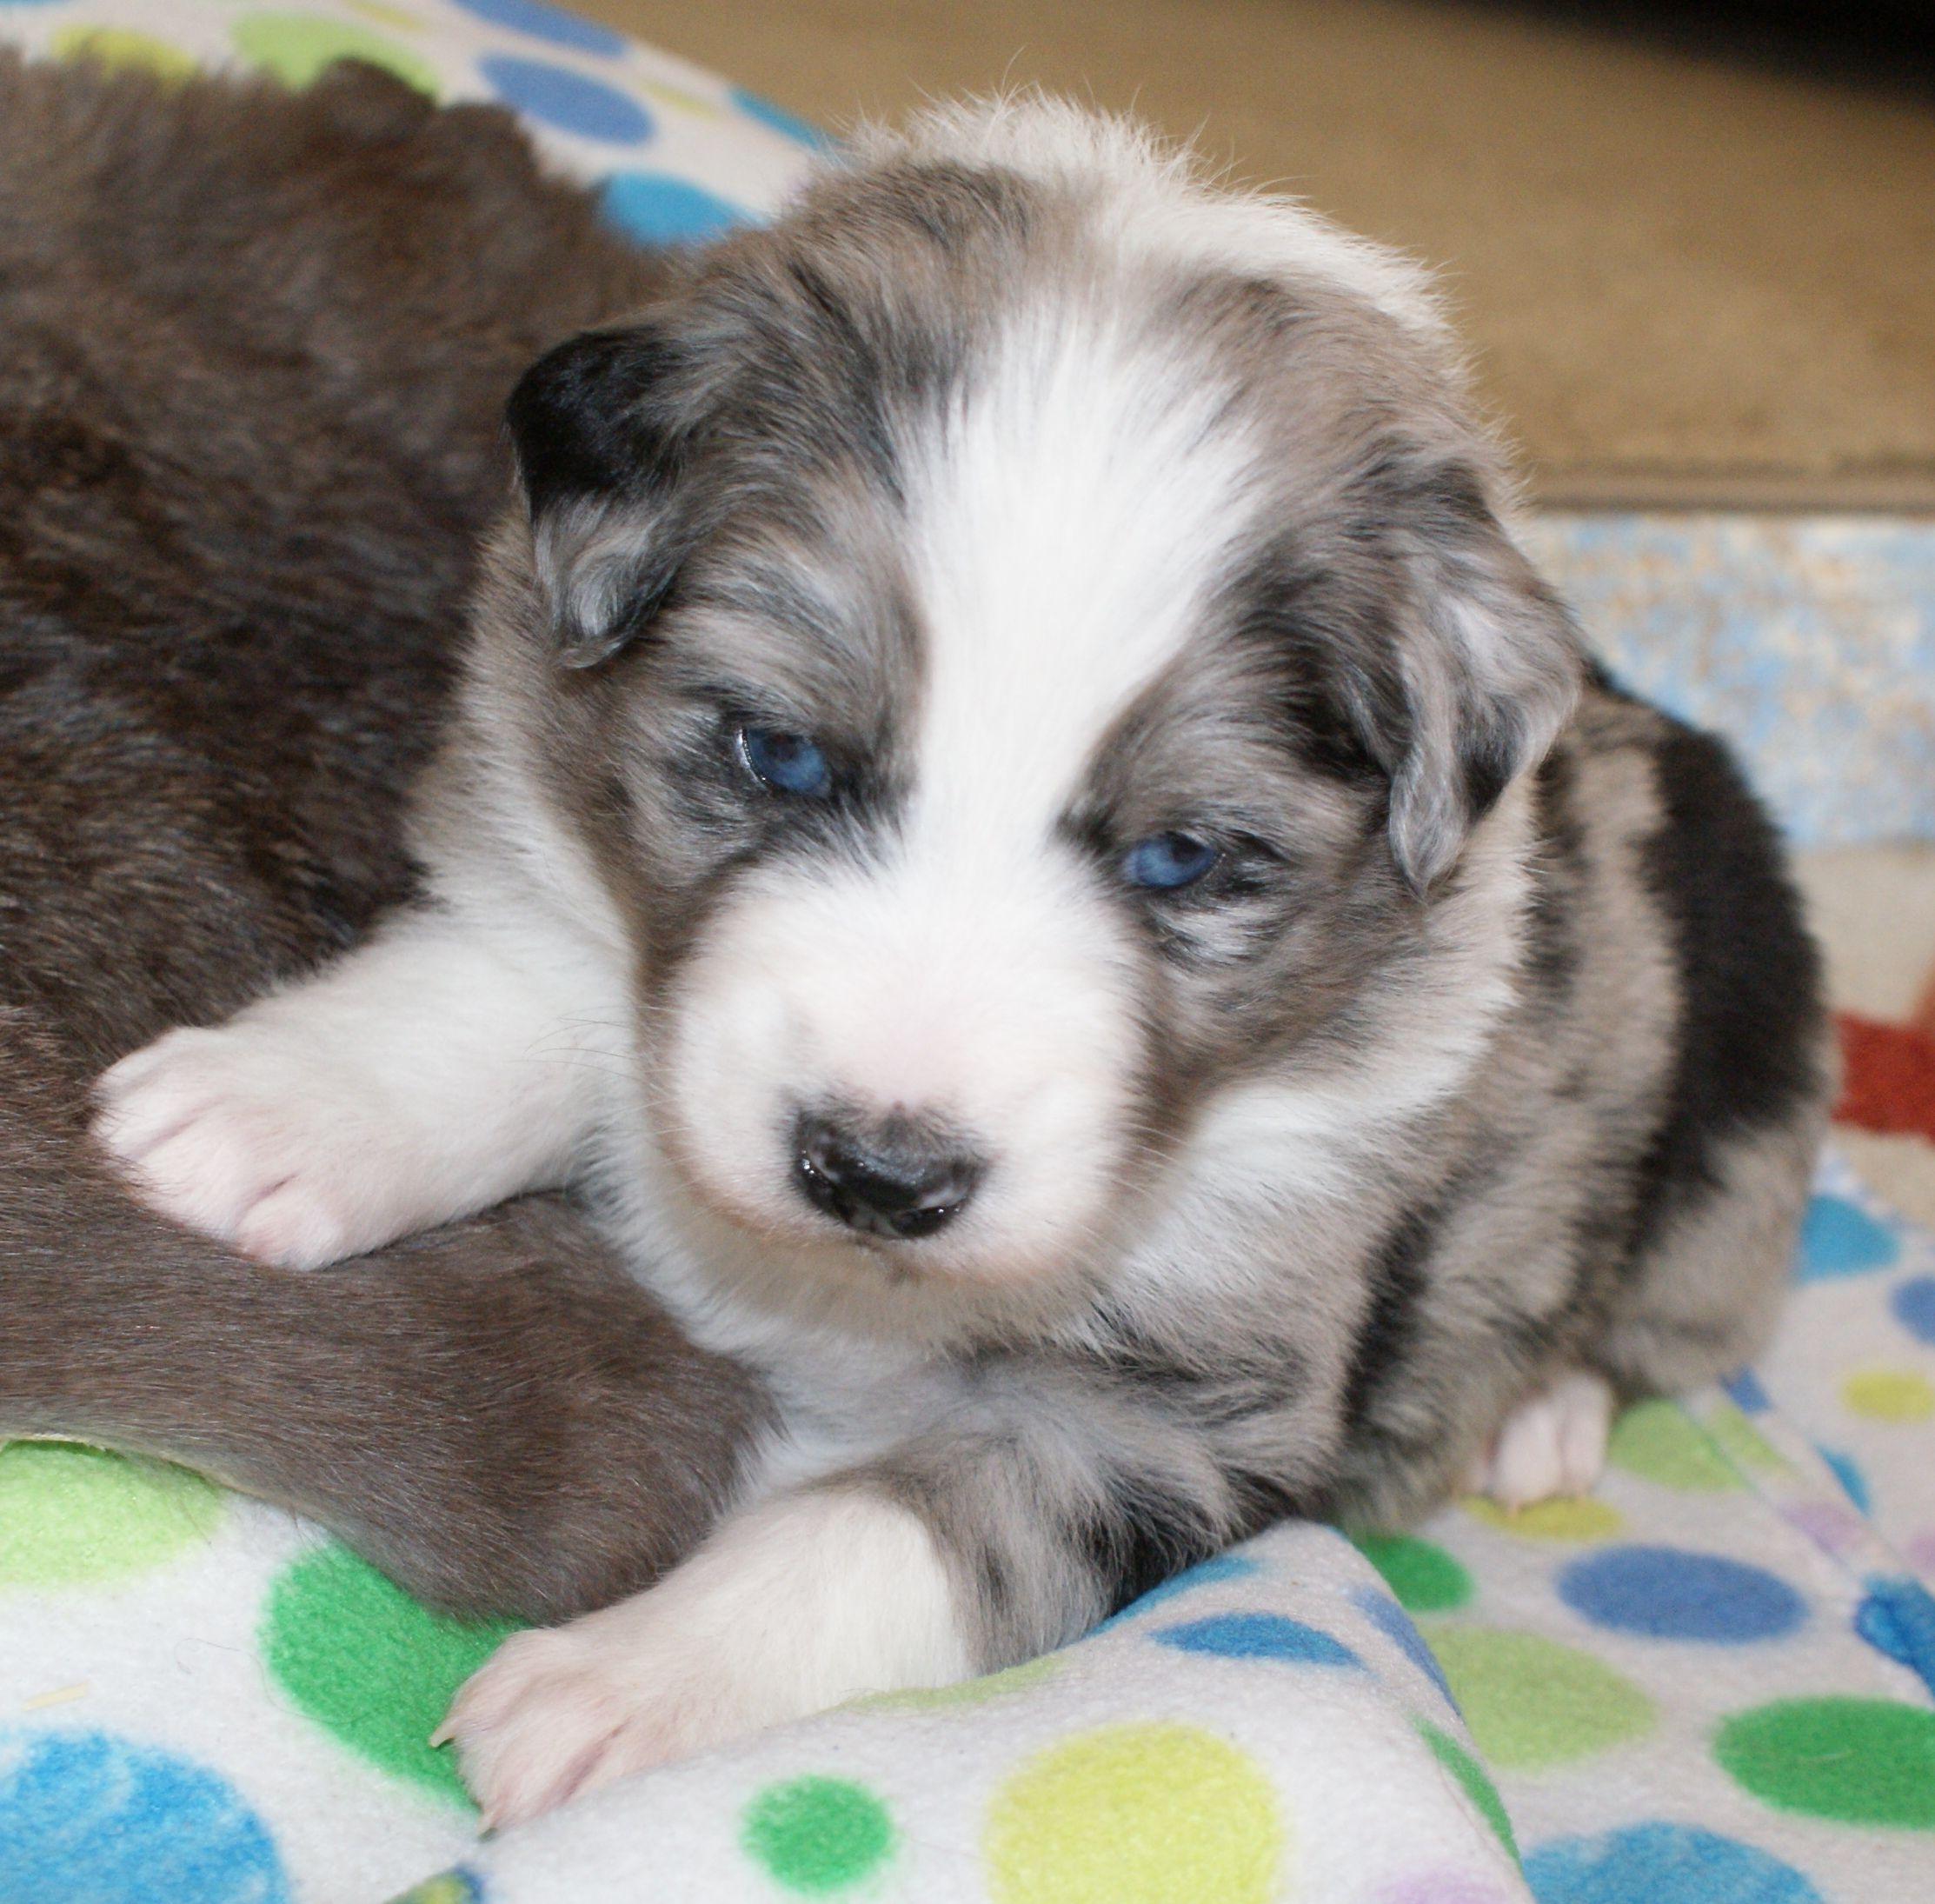 Blue Merle White Australian Shepherd Puppy Q Thermodynamic Of Imagineer Rd Cgc Dieren